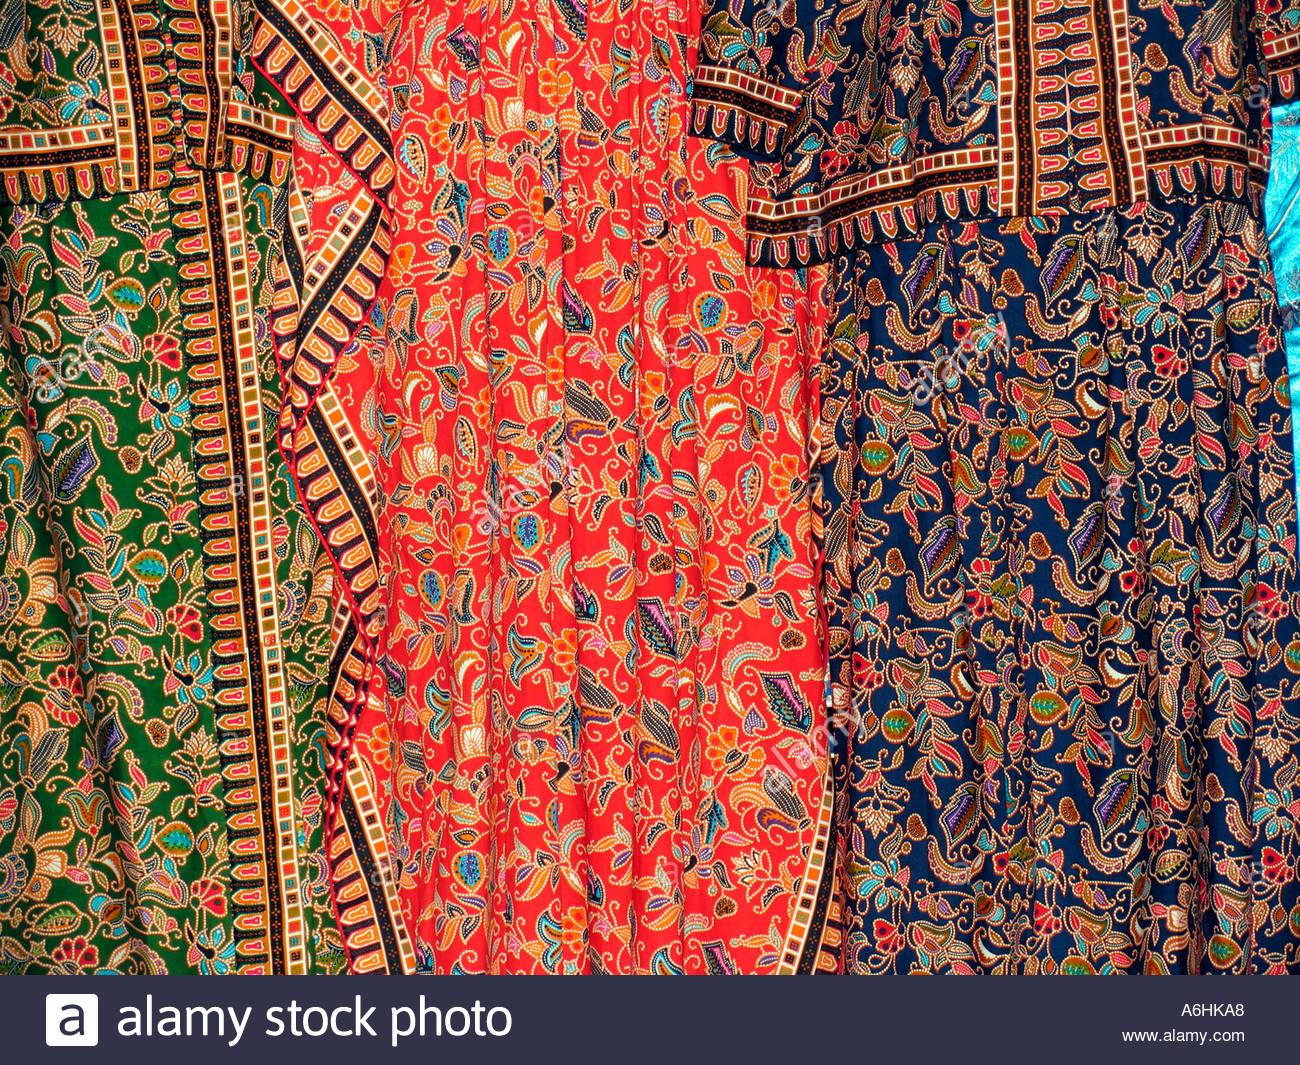 Singaporean womens jacket and skirt display - Stock Image